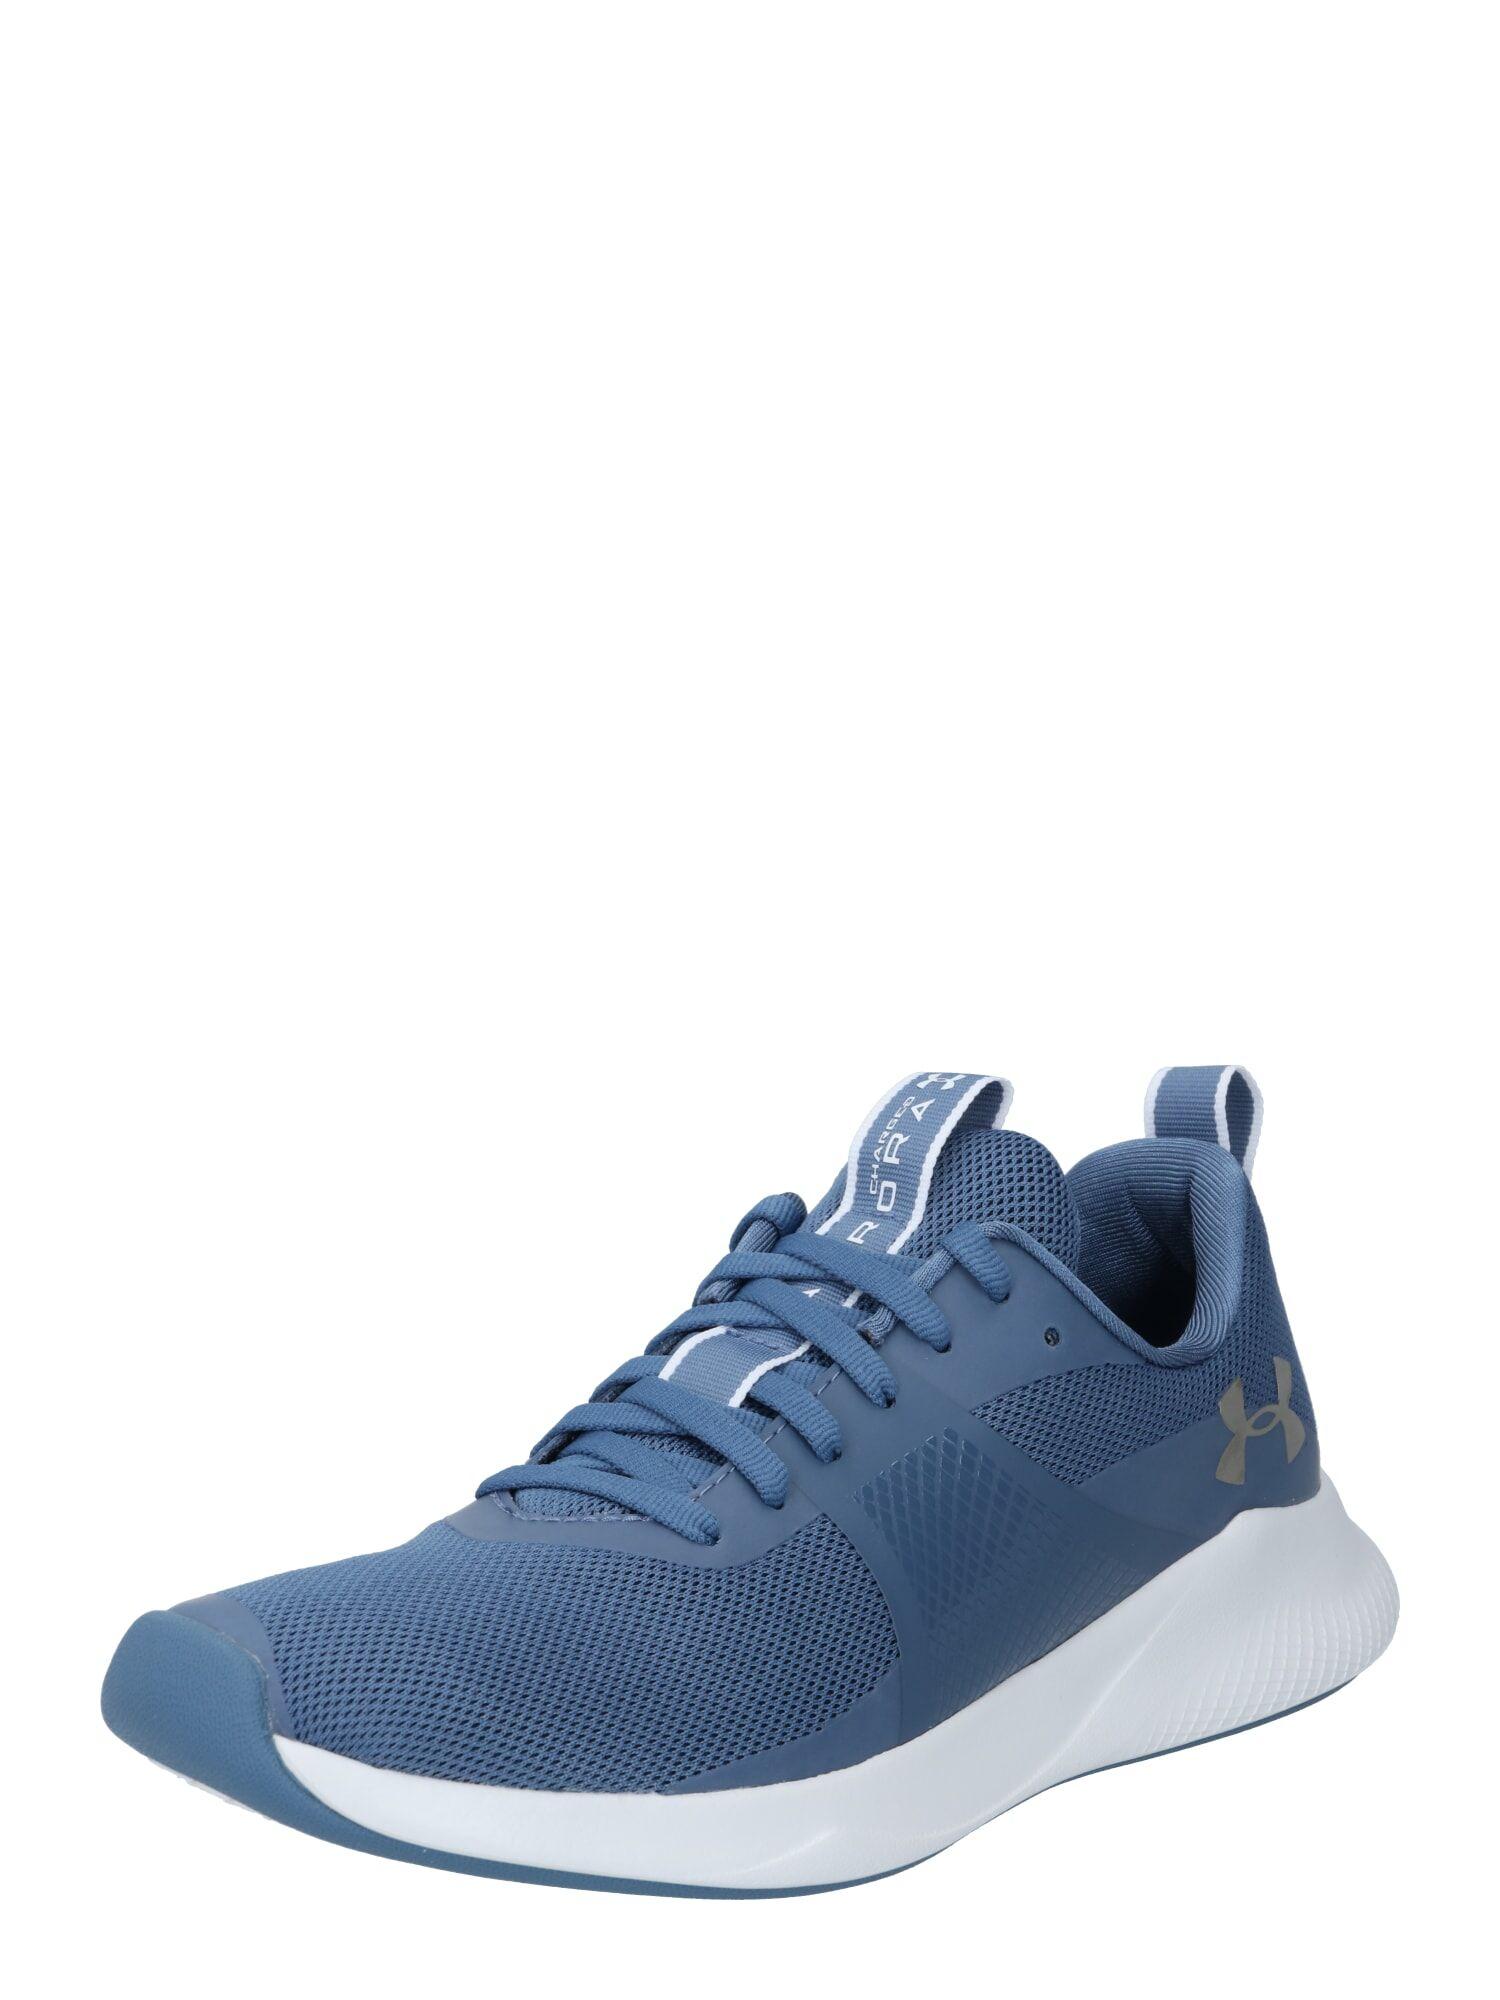 UNDER ARMOUR Chaussure de sport 'Aurora'  - Bleu - Taille: 5 - female